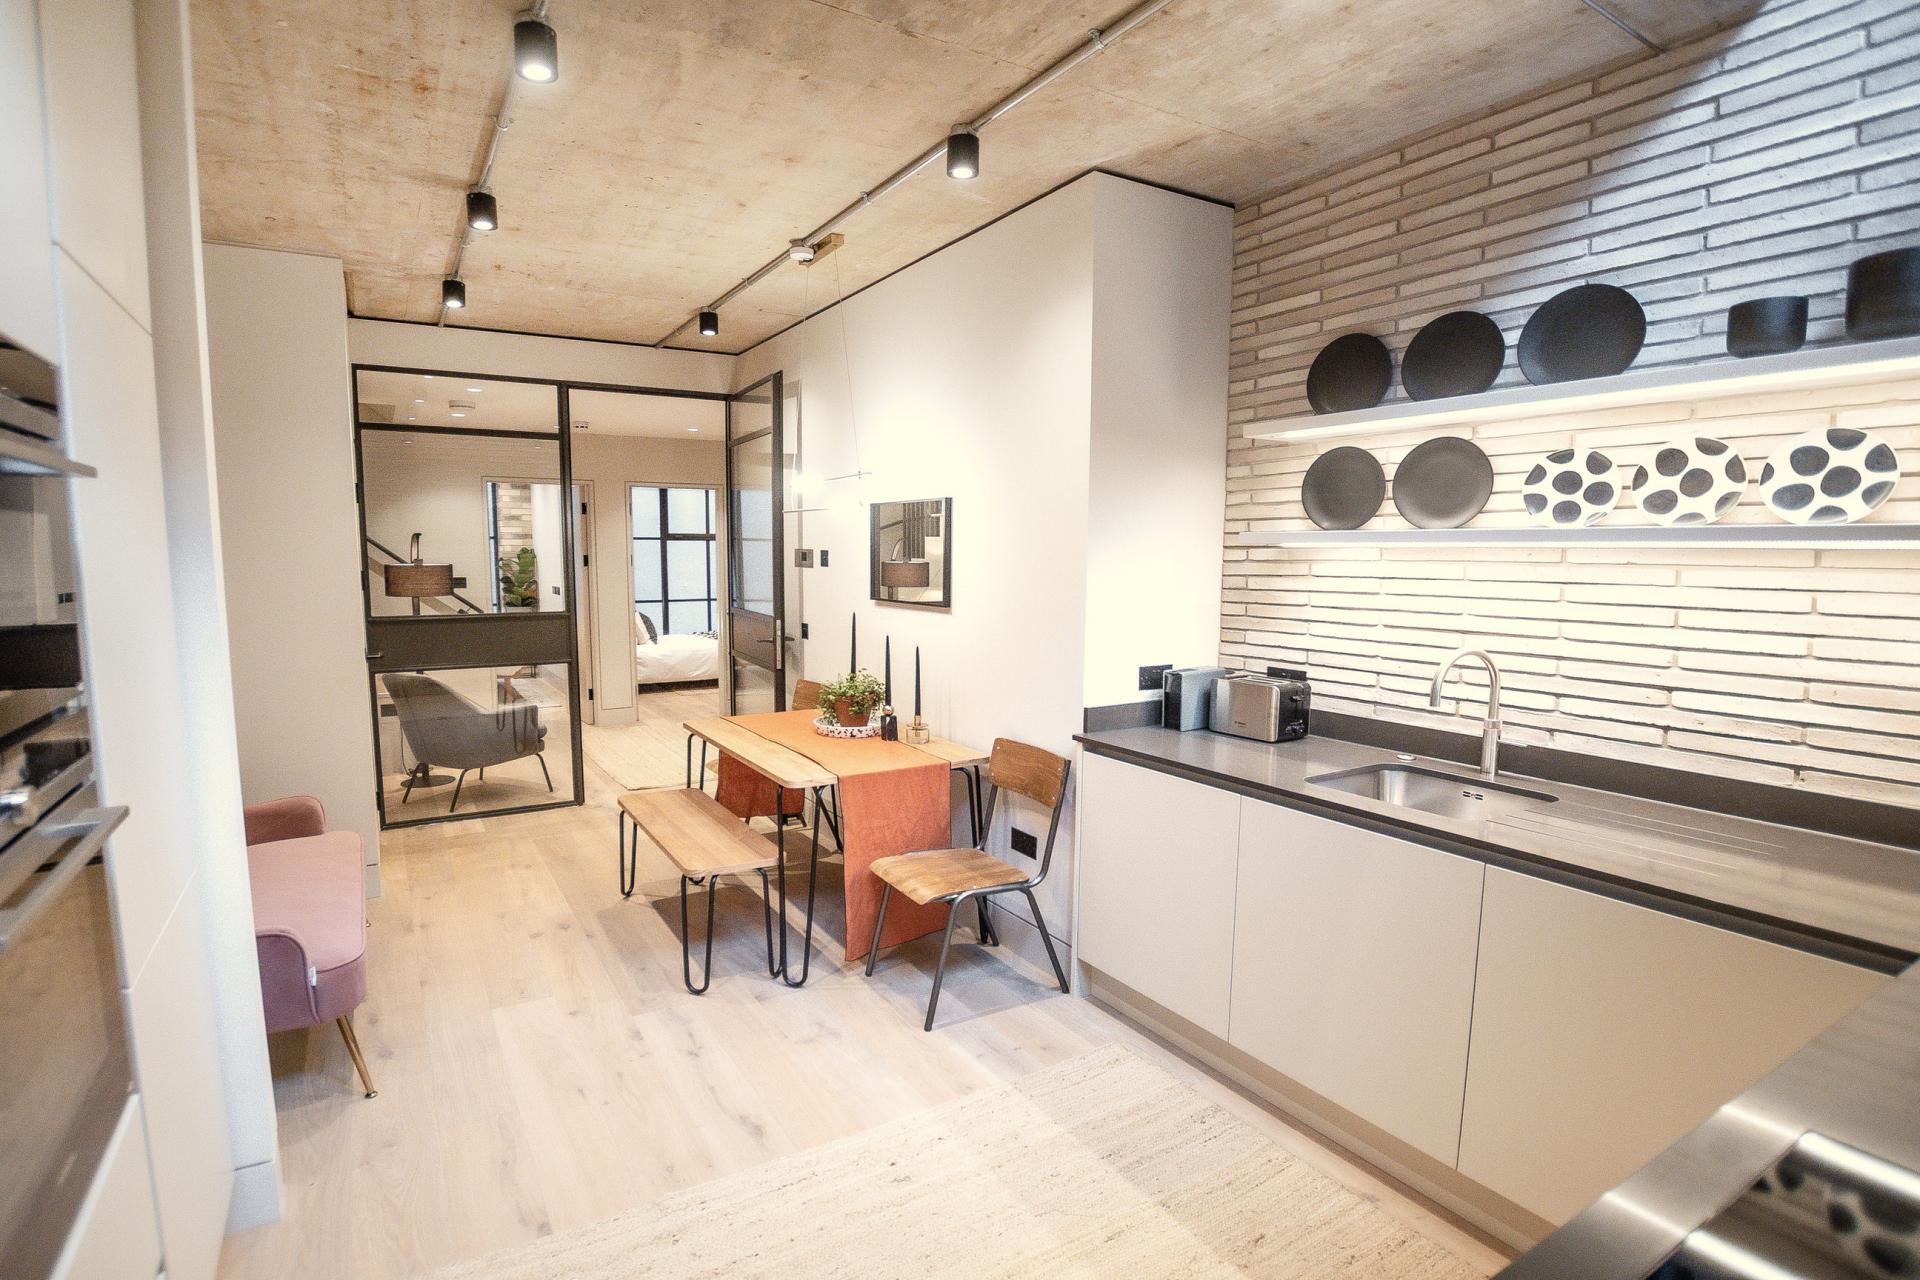 Spacious kitchen at King's Mews Apartments, Holborn, London - Citybase Apartments